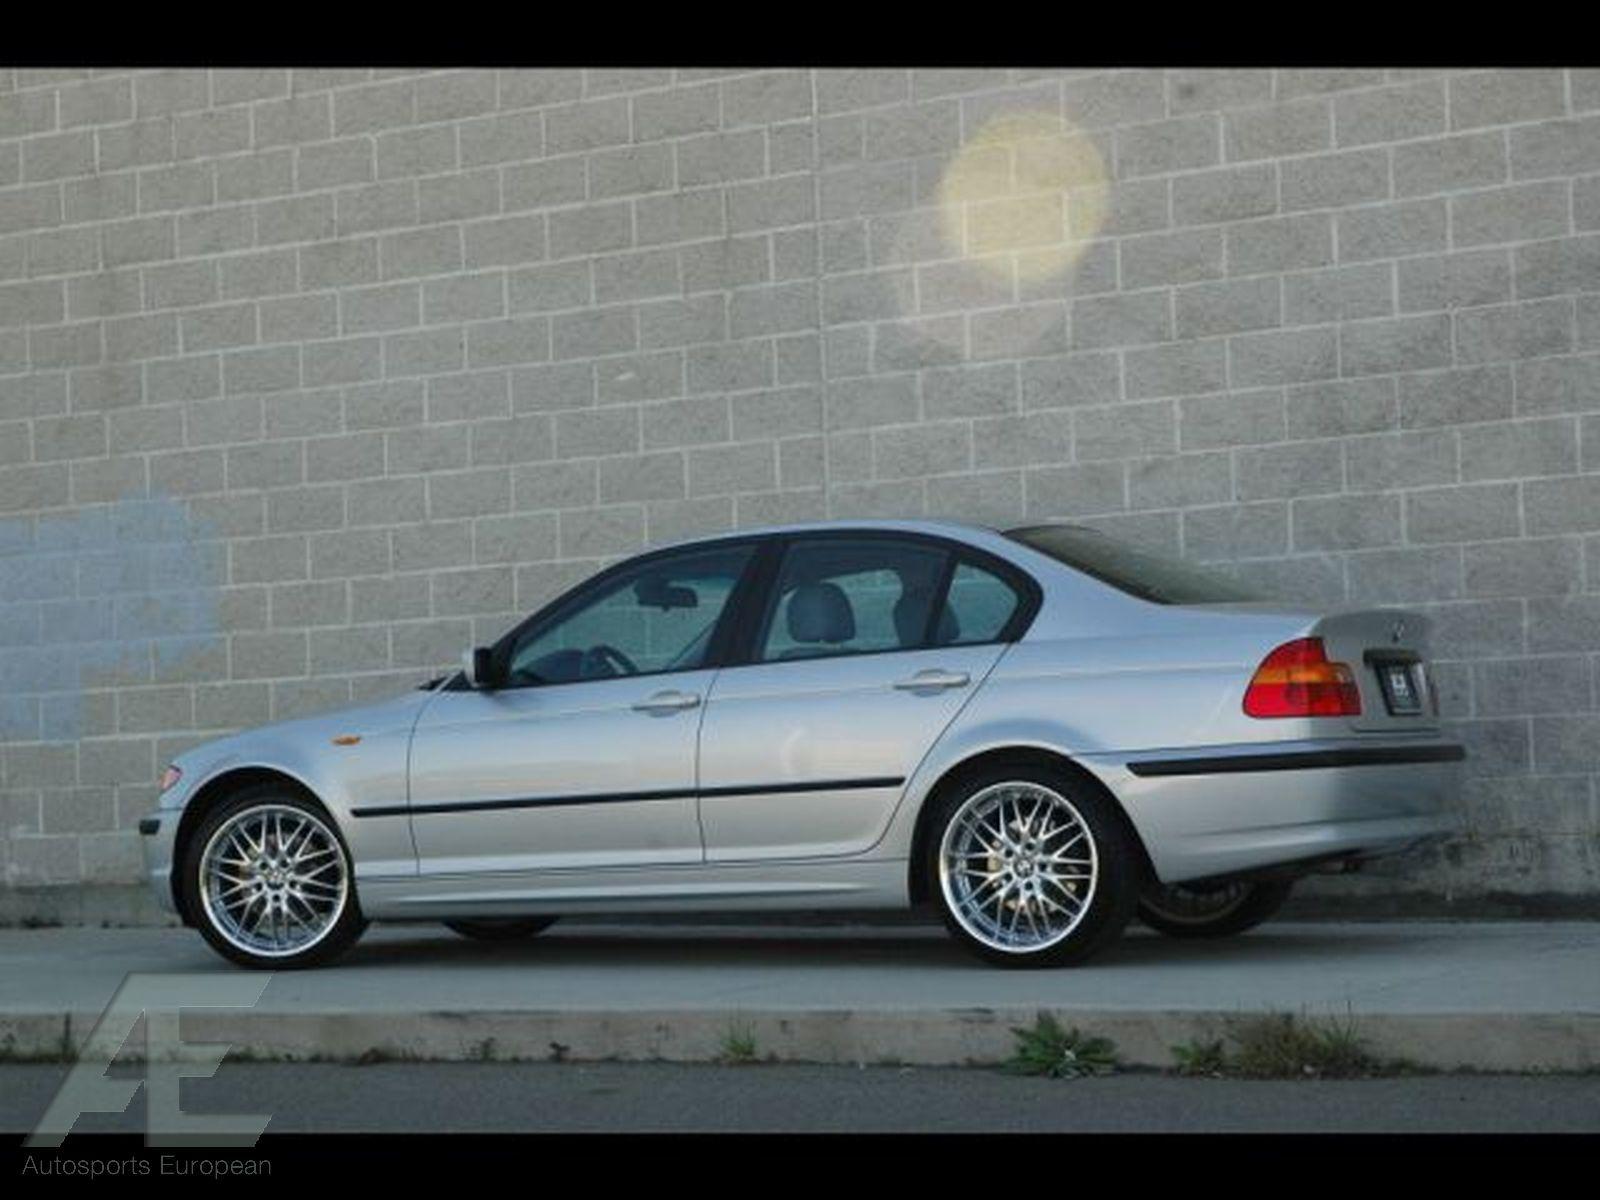 19 BMW Wheels Rim Tires 325i 325xi 325CI E46 E90 M3